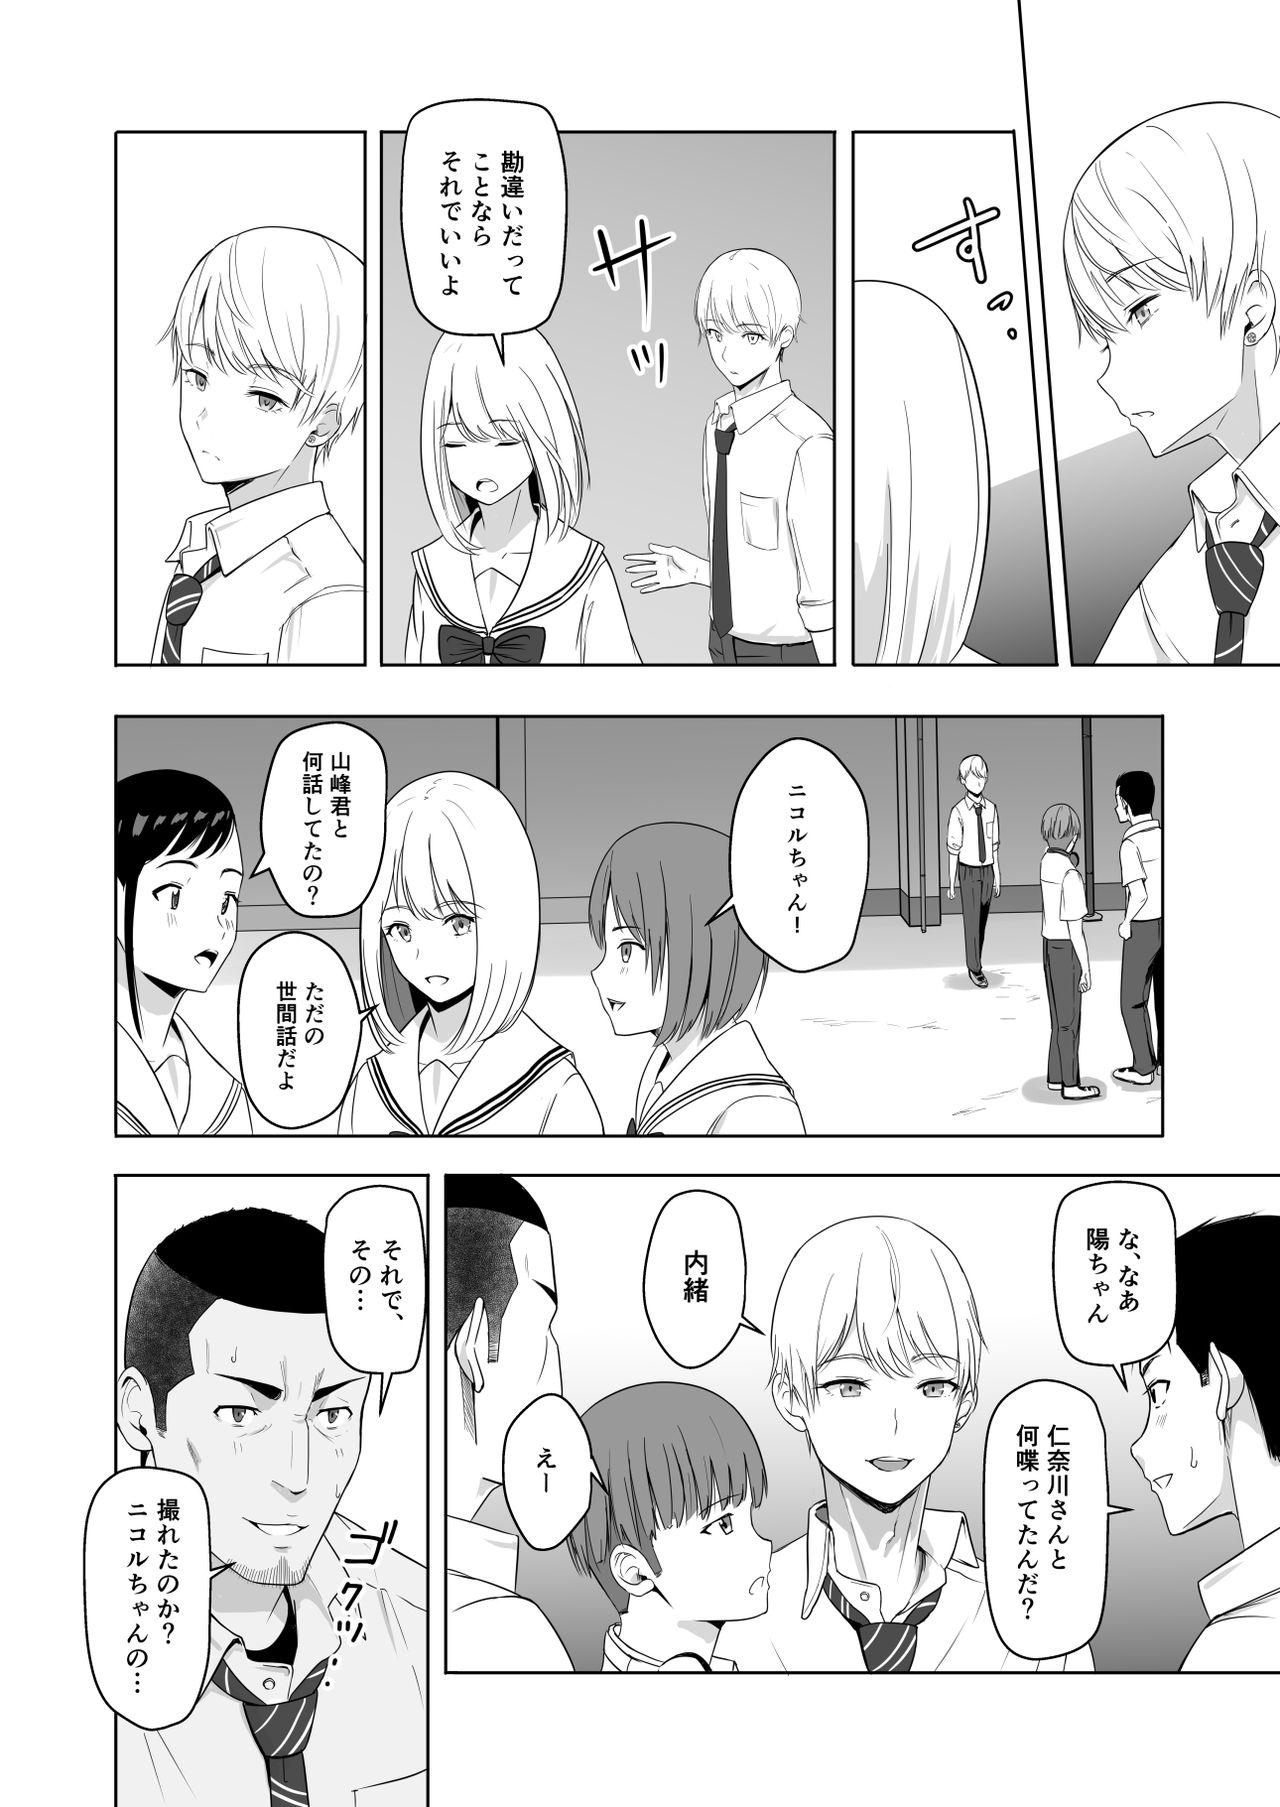 Kimi ga Tame. 2 Ichikawa Inori 28